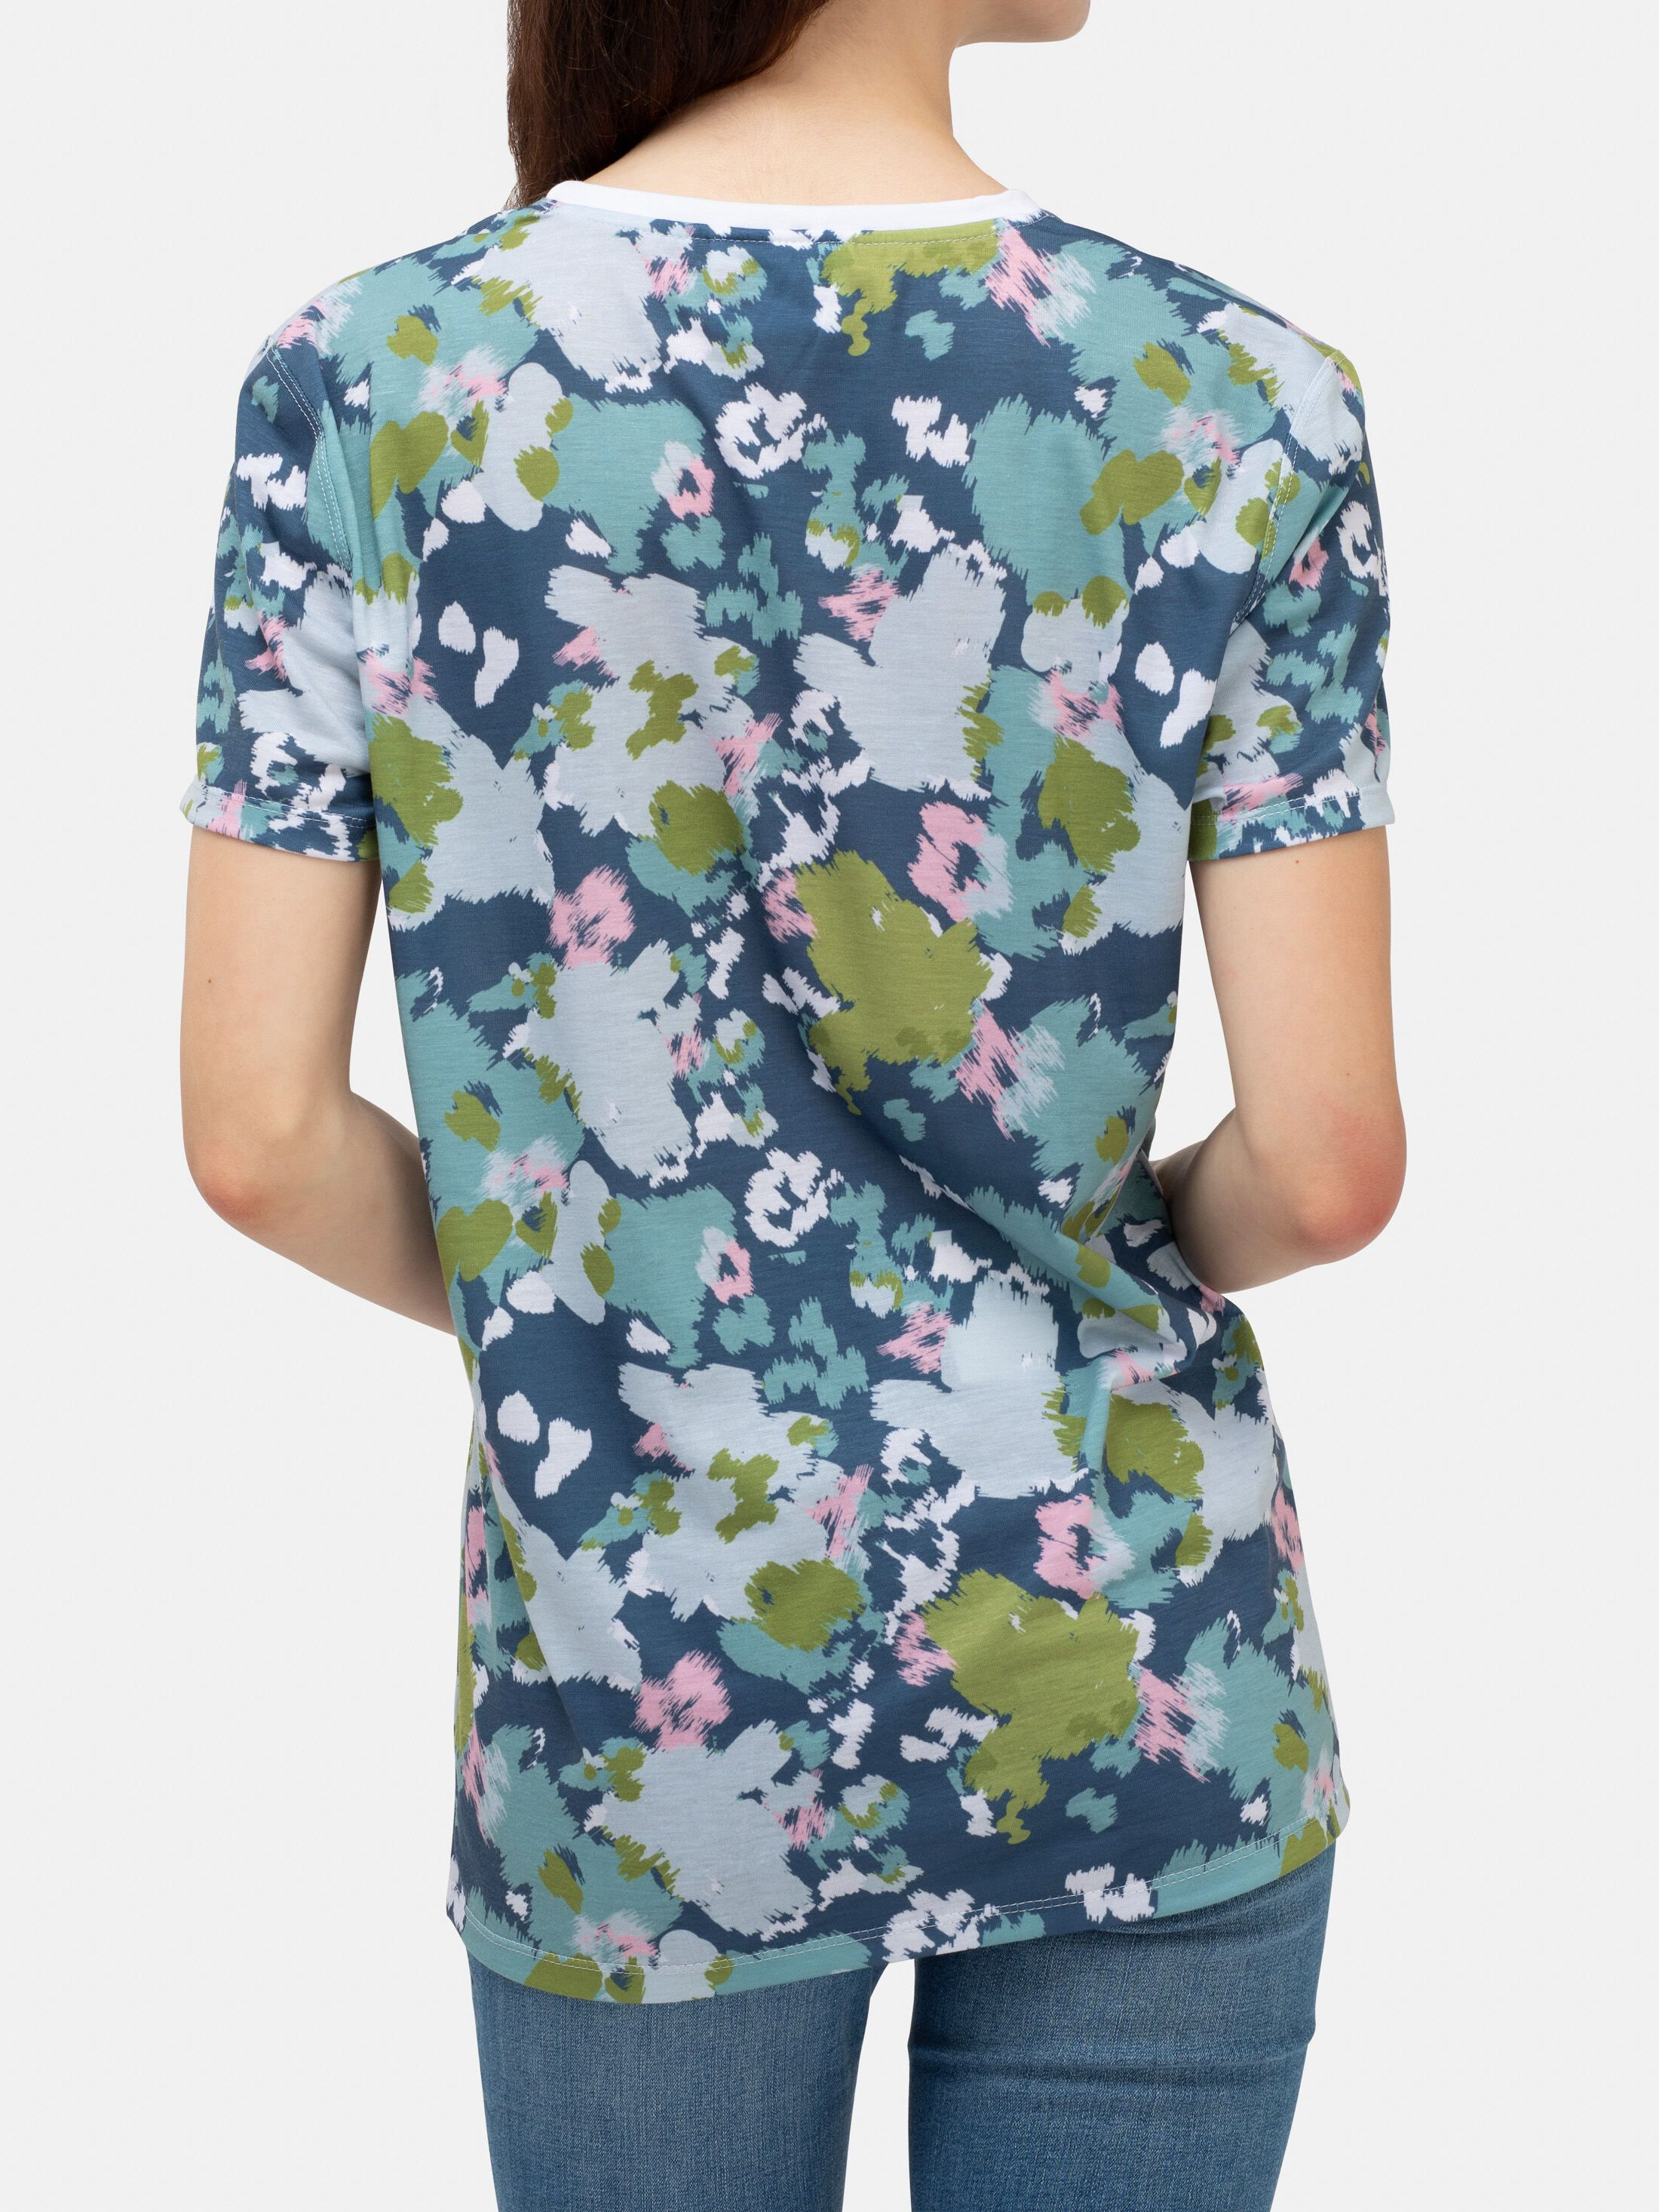 design all over print t shirt Ireland